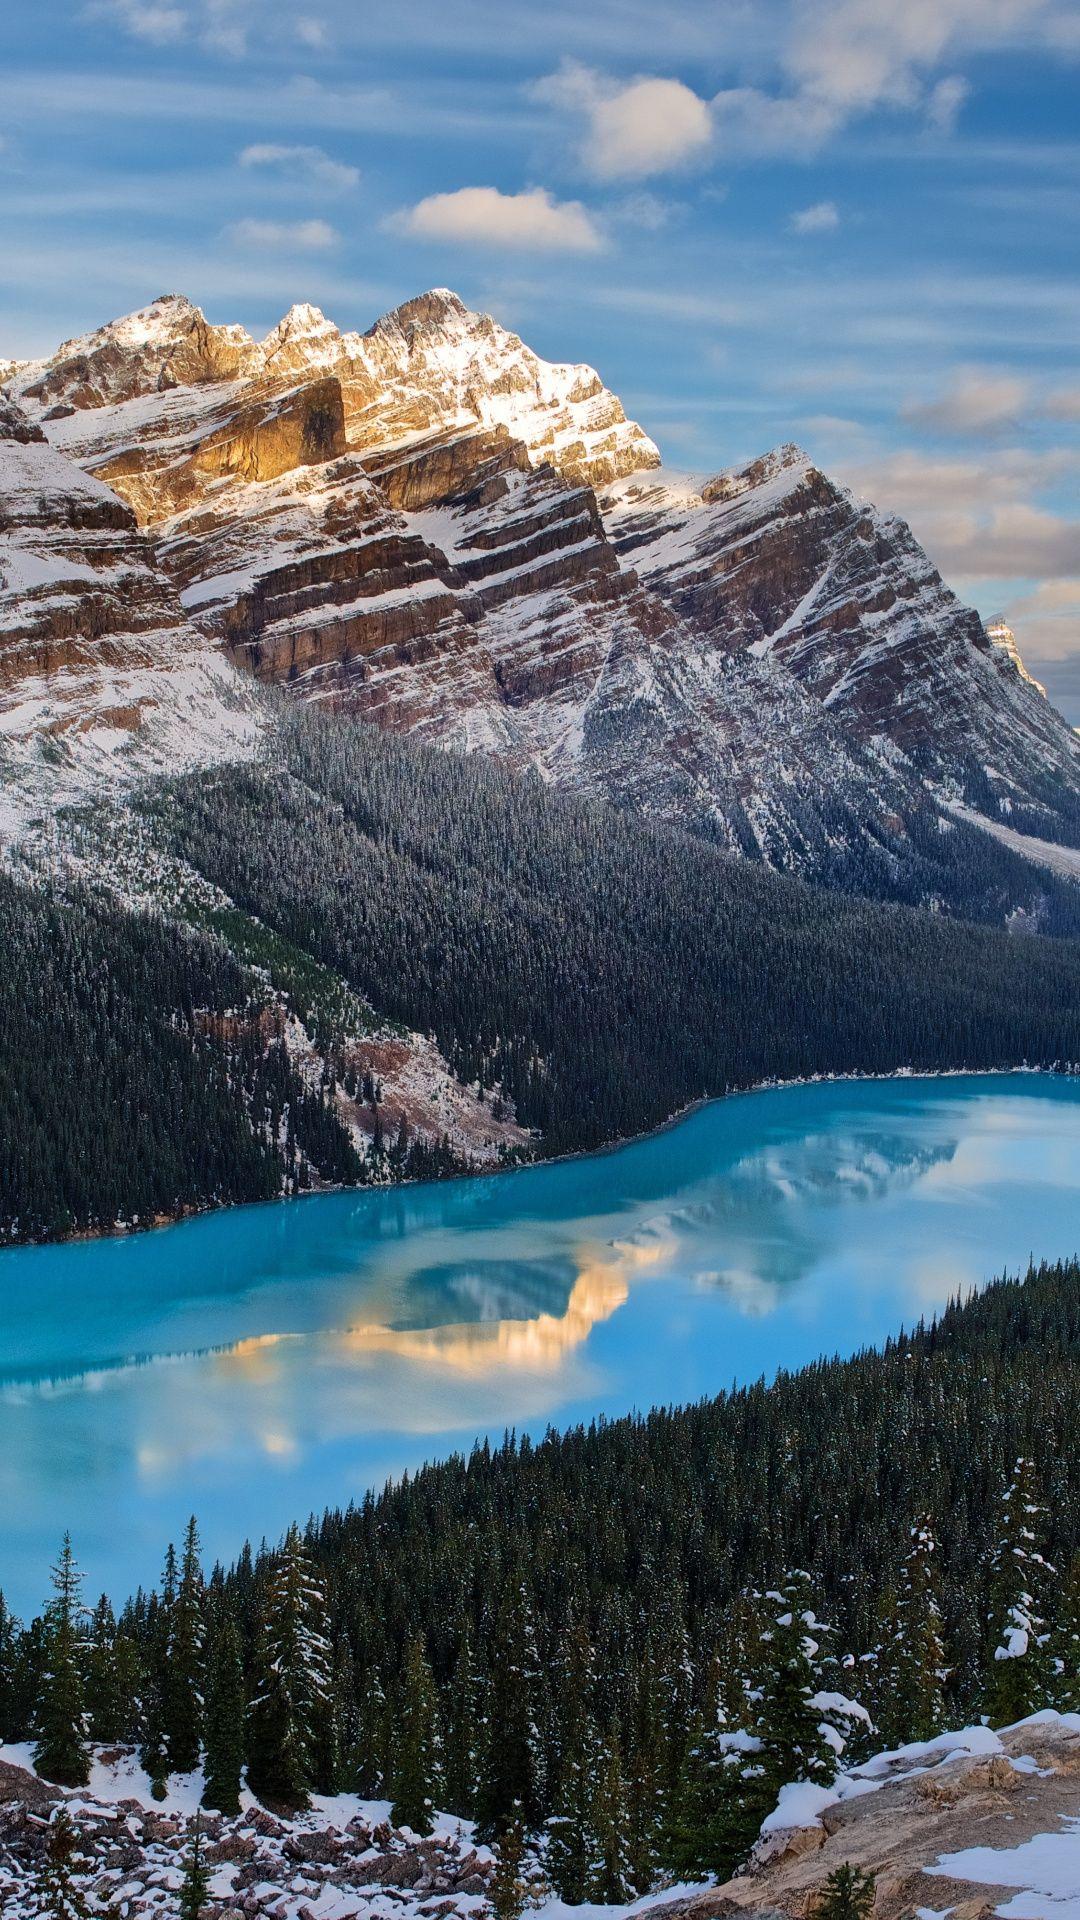 Mountains Nature Blue Water Peyto Lake Canada 1080x1920